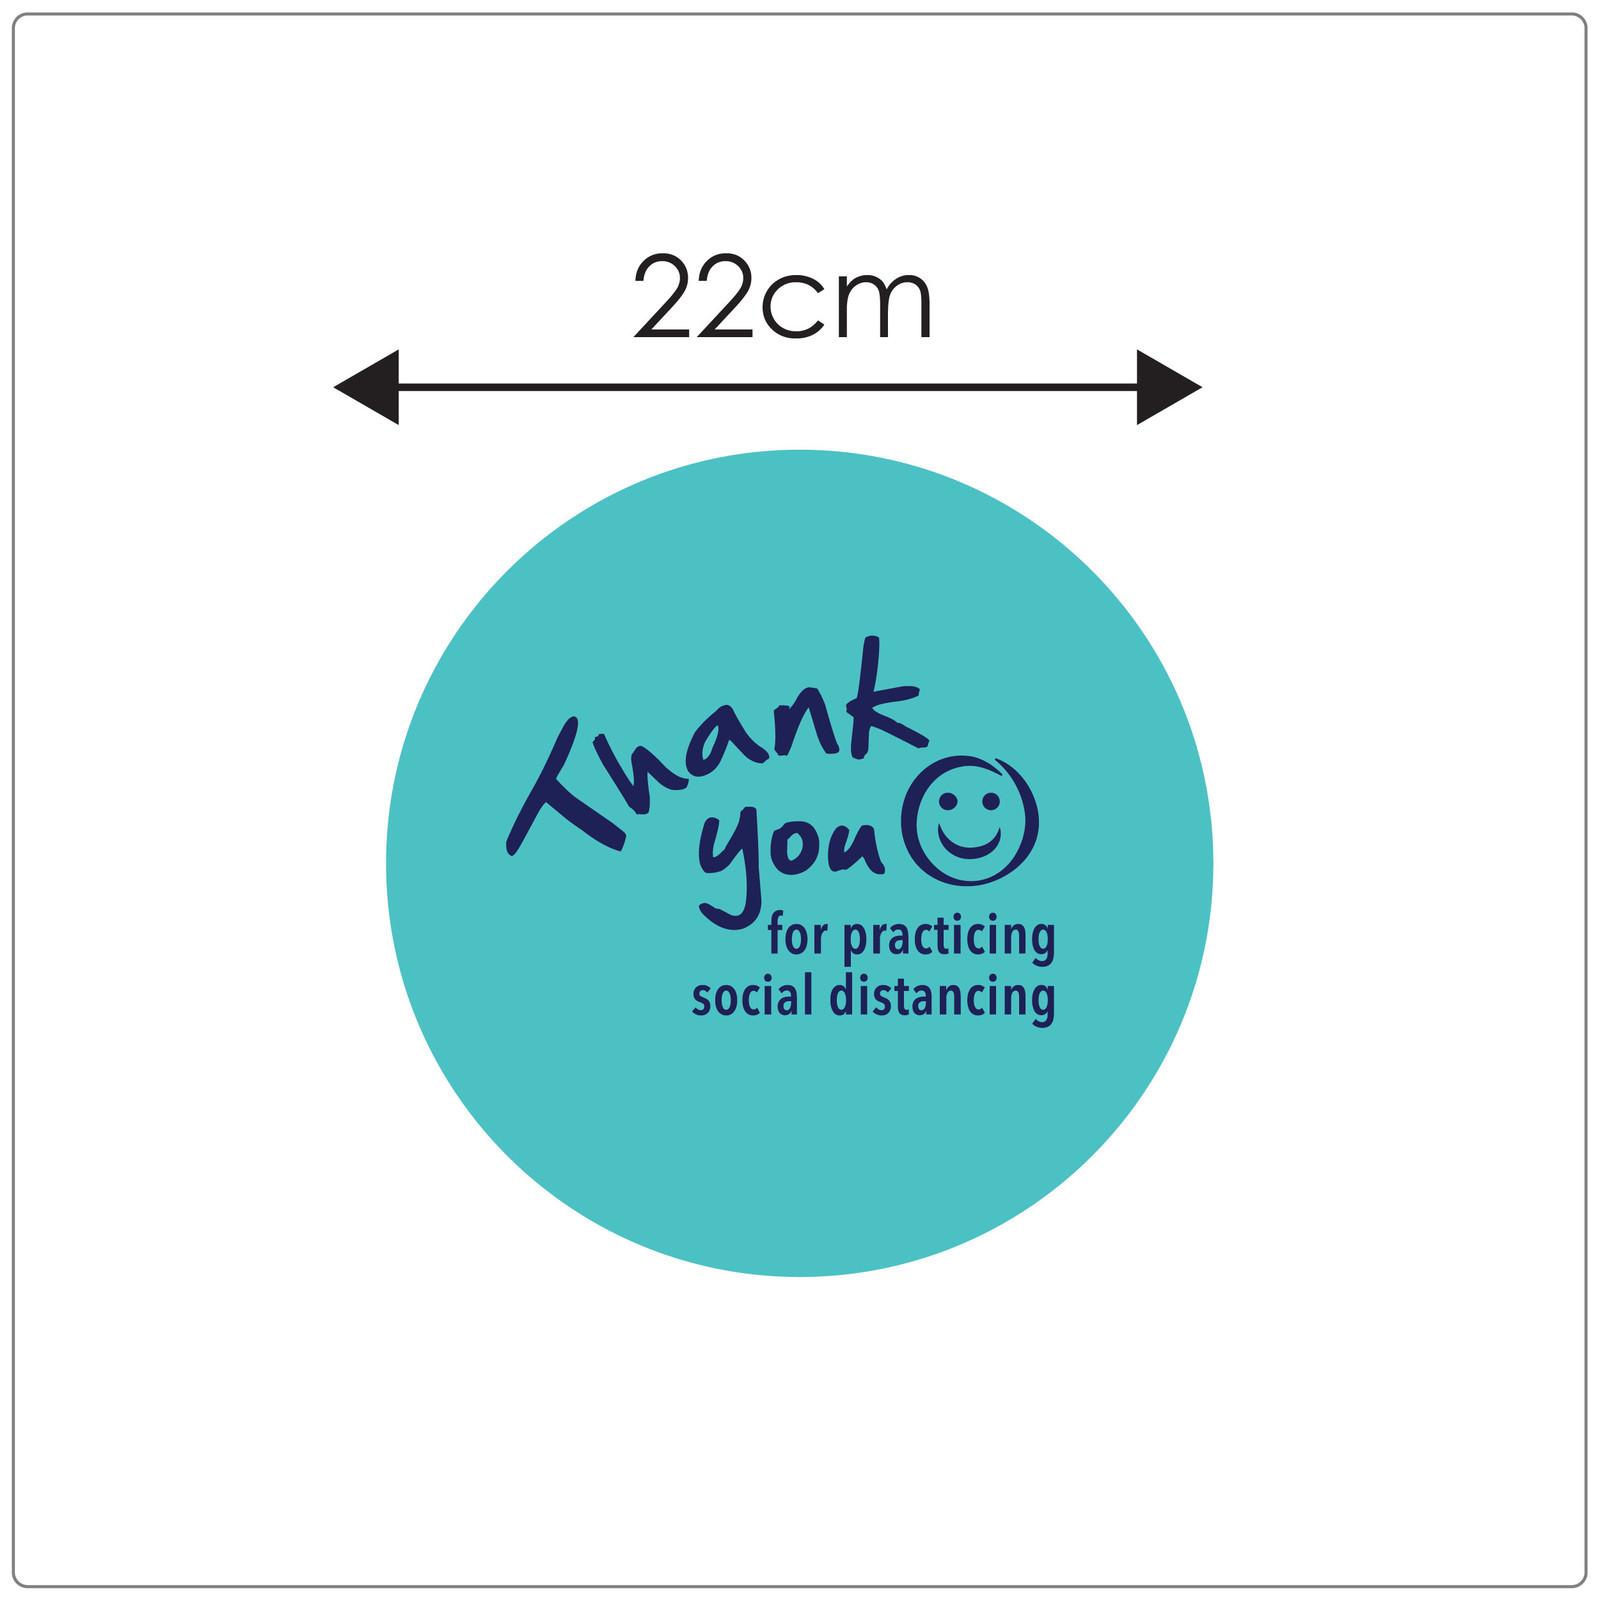 social distancing floor sticker for hard floors, sizing, teal Self-adhesive Corona virus floor sticker to help social distancing.